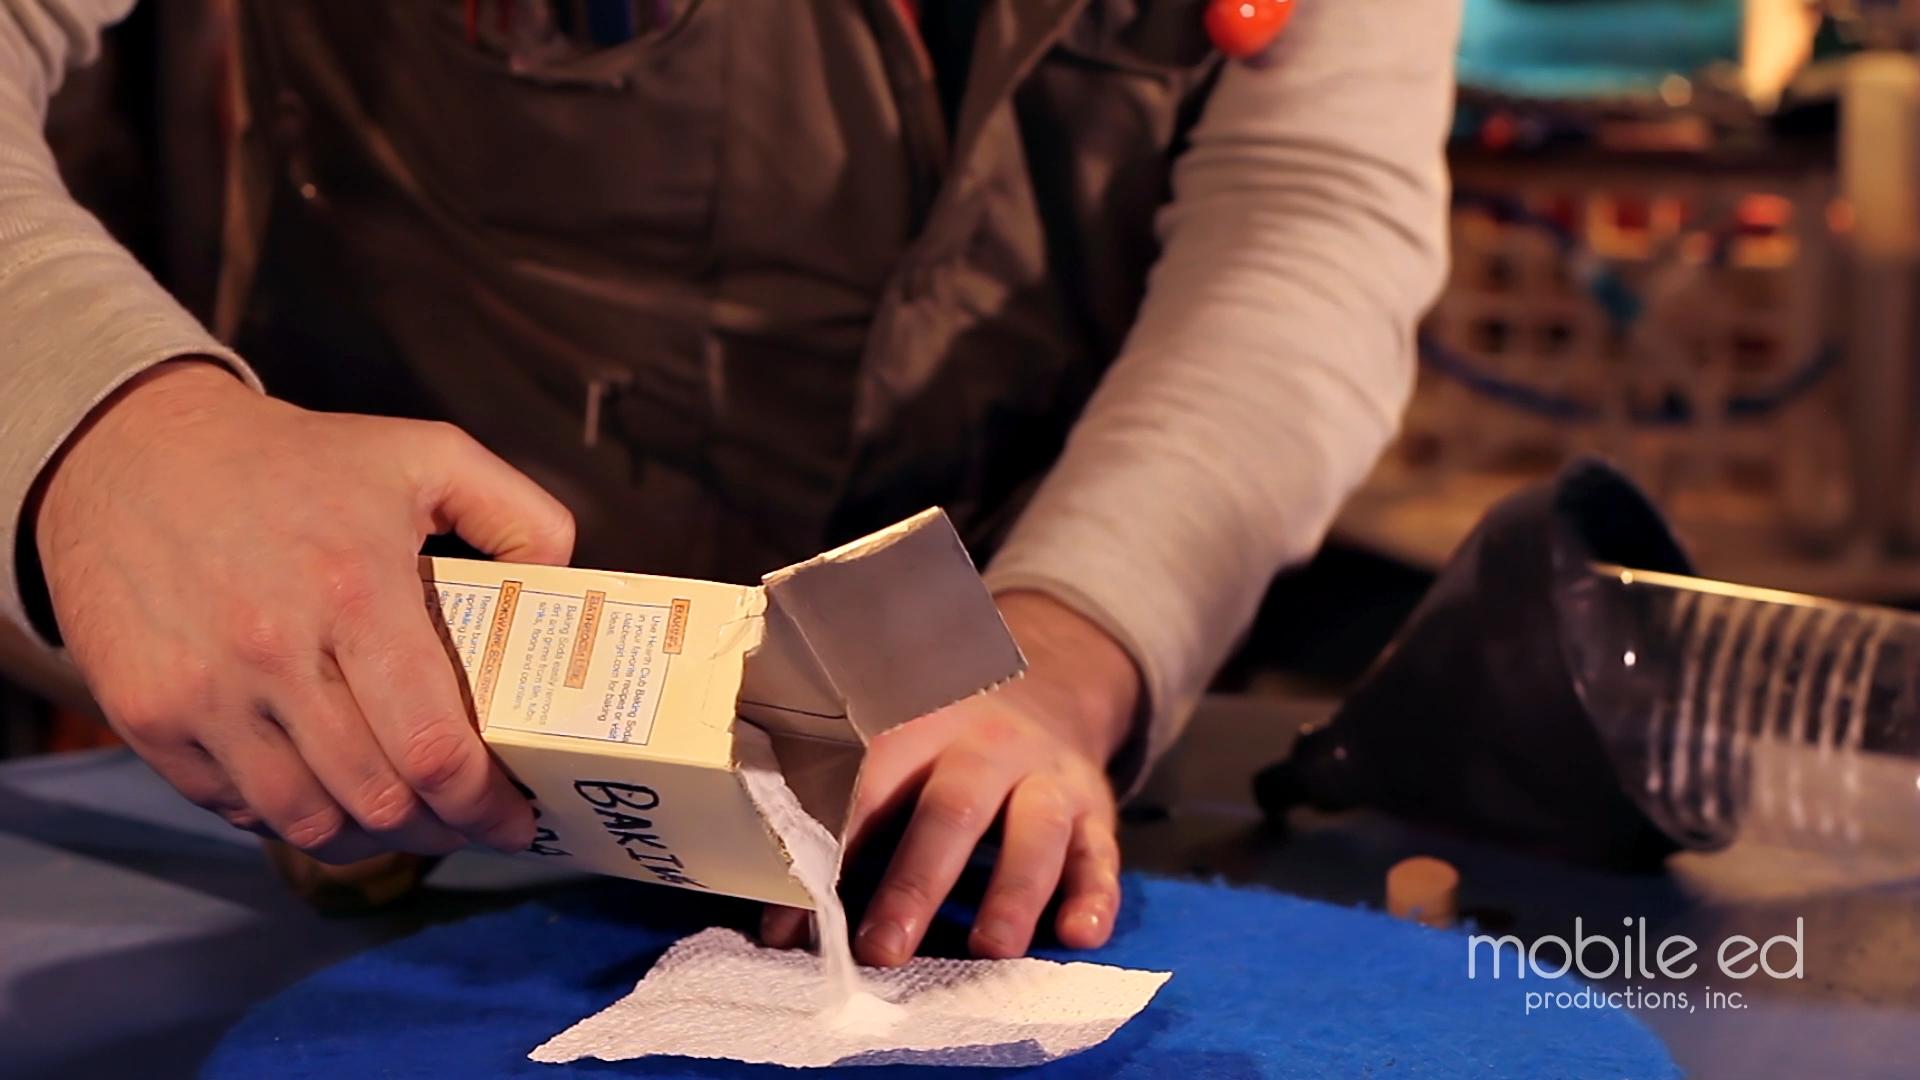 Build your own rocket - pour baking soda |  Handy Dan the Junkyard Man